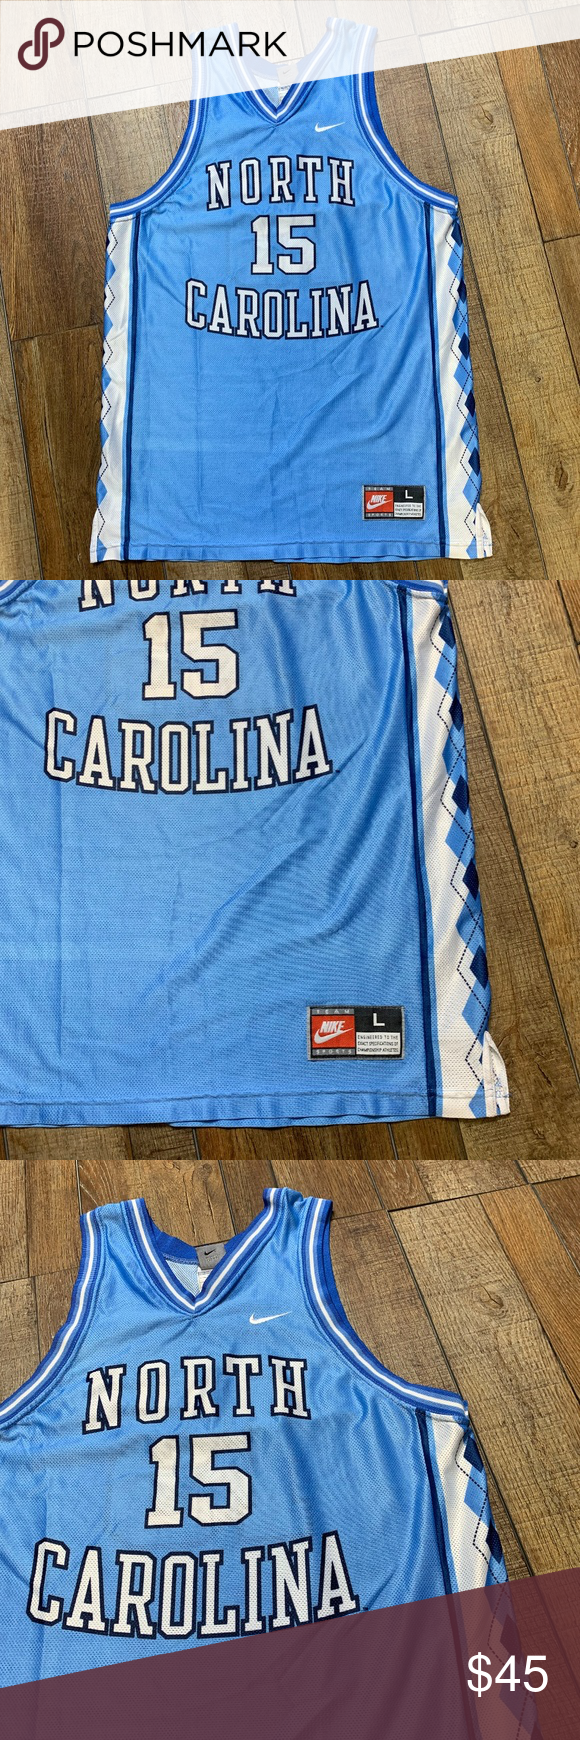 751a9e5689e4 Vince Carter UNC Tarheels Vintage Nike NCAA Jersey Vince Carter  15 North  Carolina Tarheels 1996-97 College Basketball Season Perfect Condition  Authentic ...